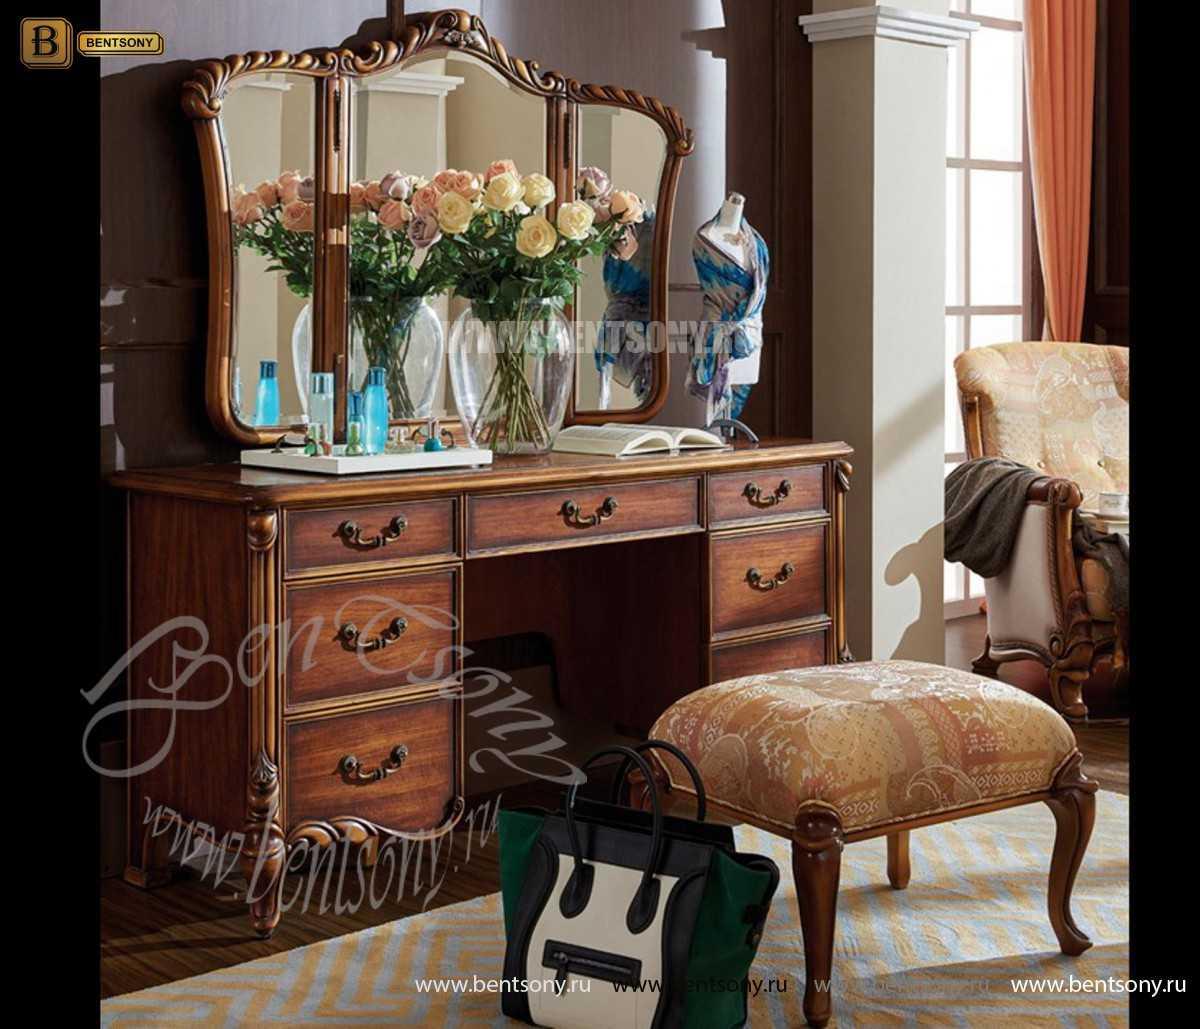 Спальня Лоренс С (Классика, Ткань) для загородного дома